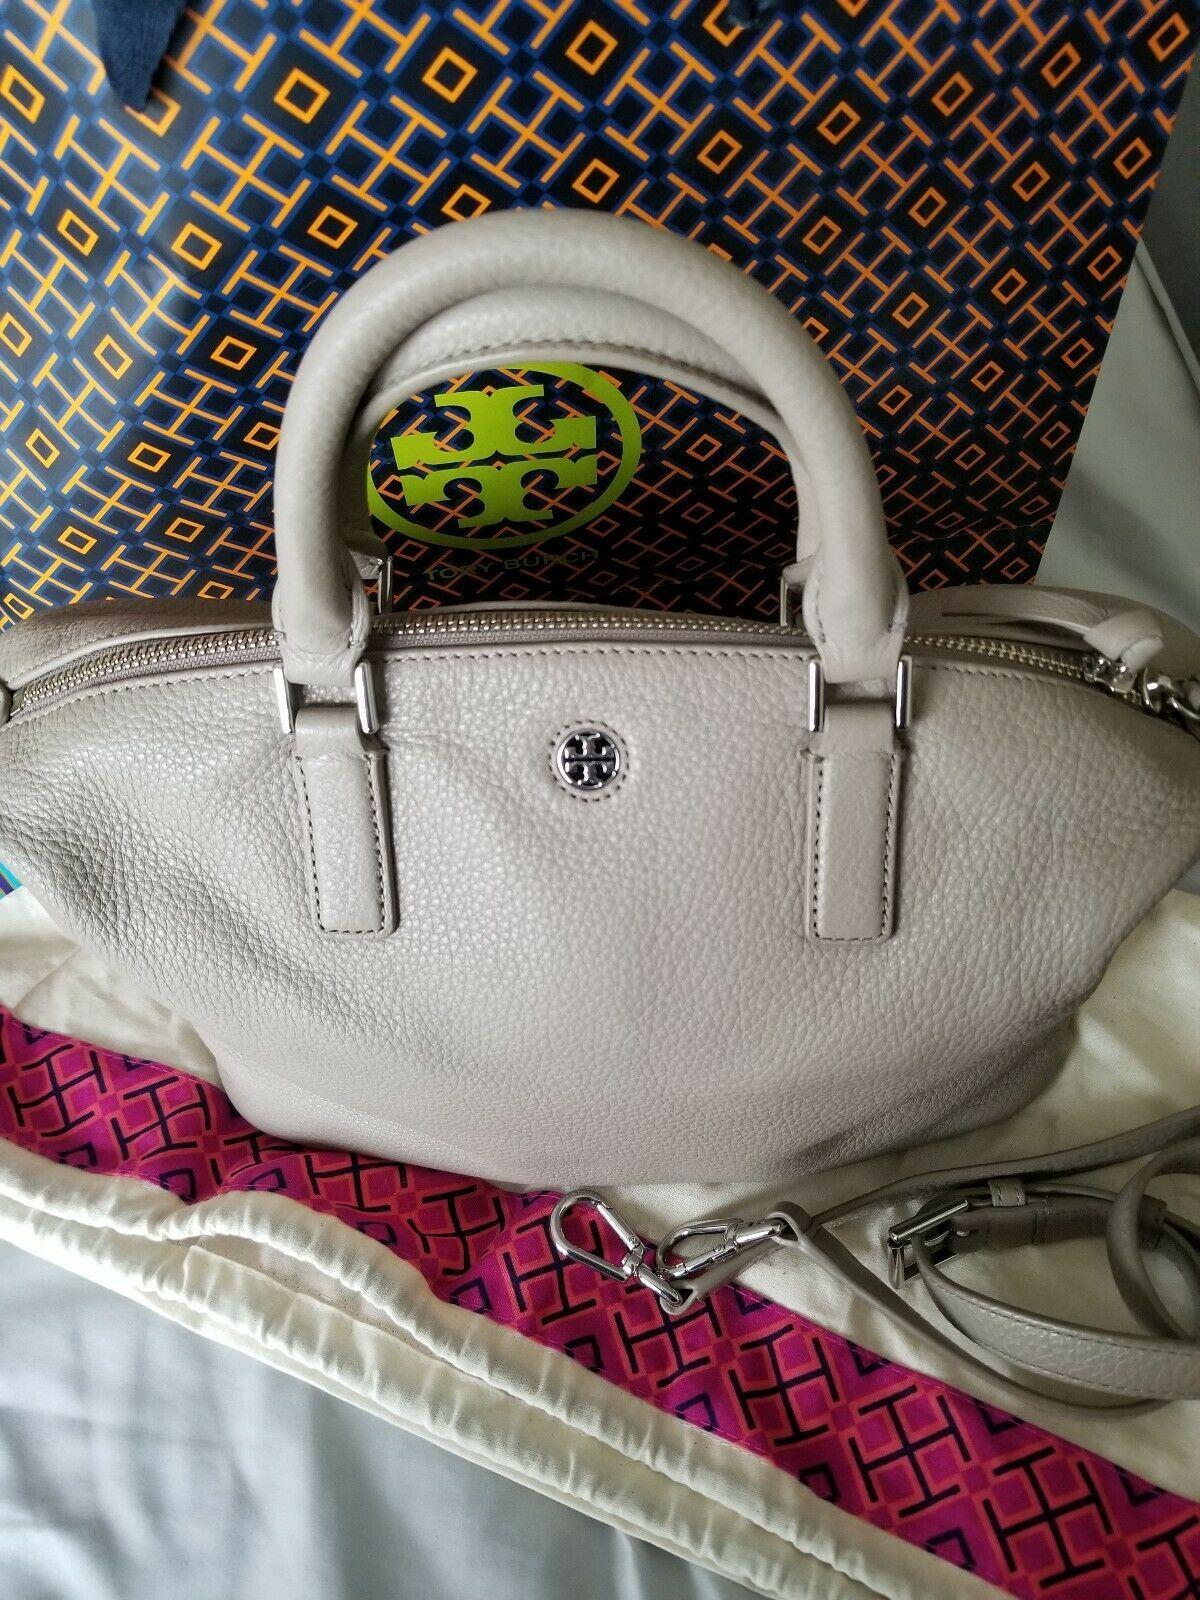 TORY BURCH $495 Brody French Gray Leather Crossbody Bag Handbag